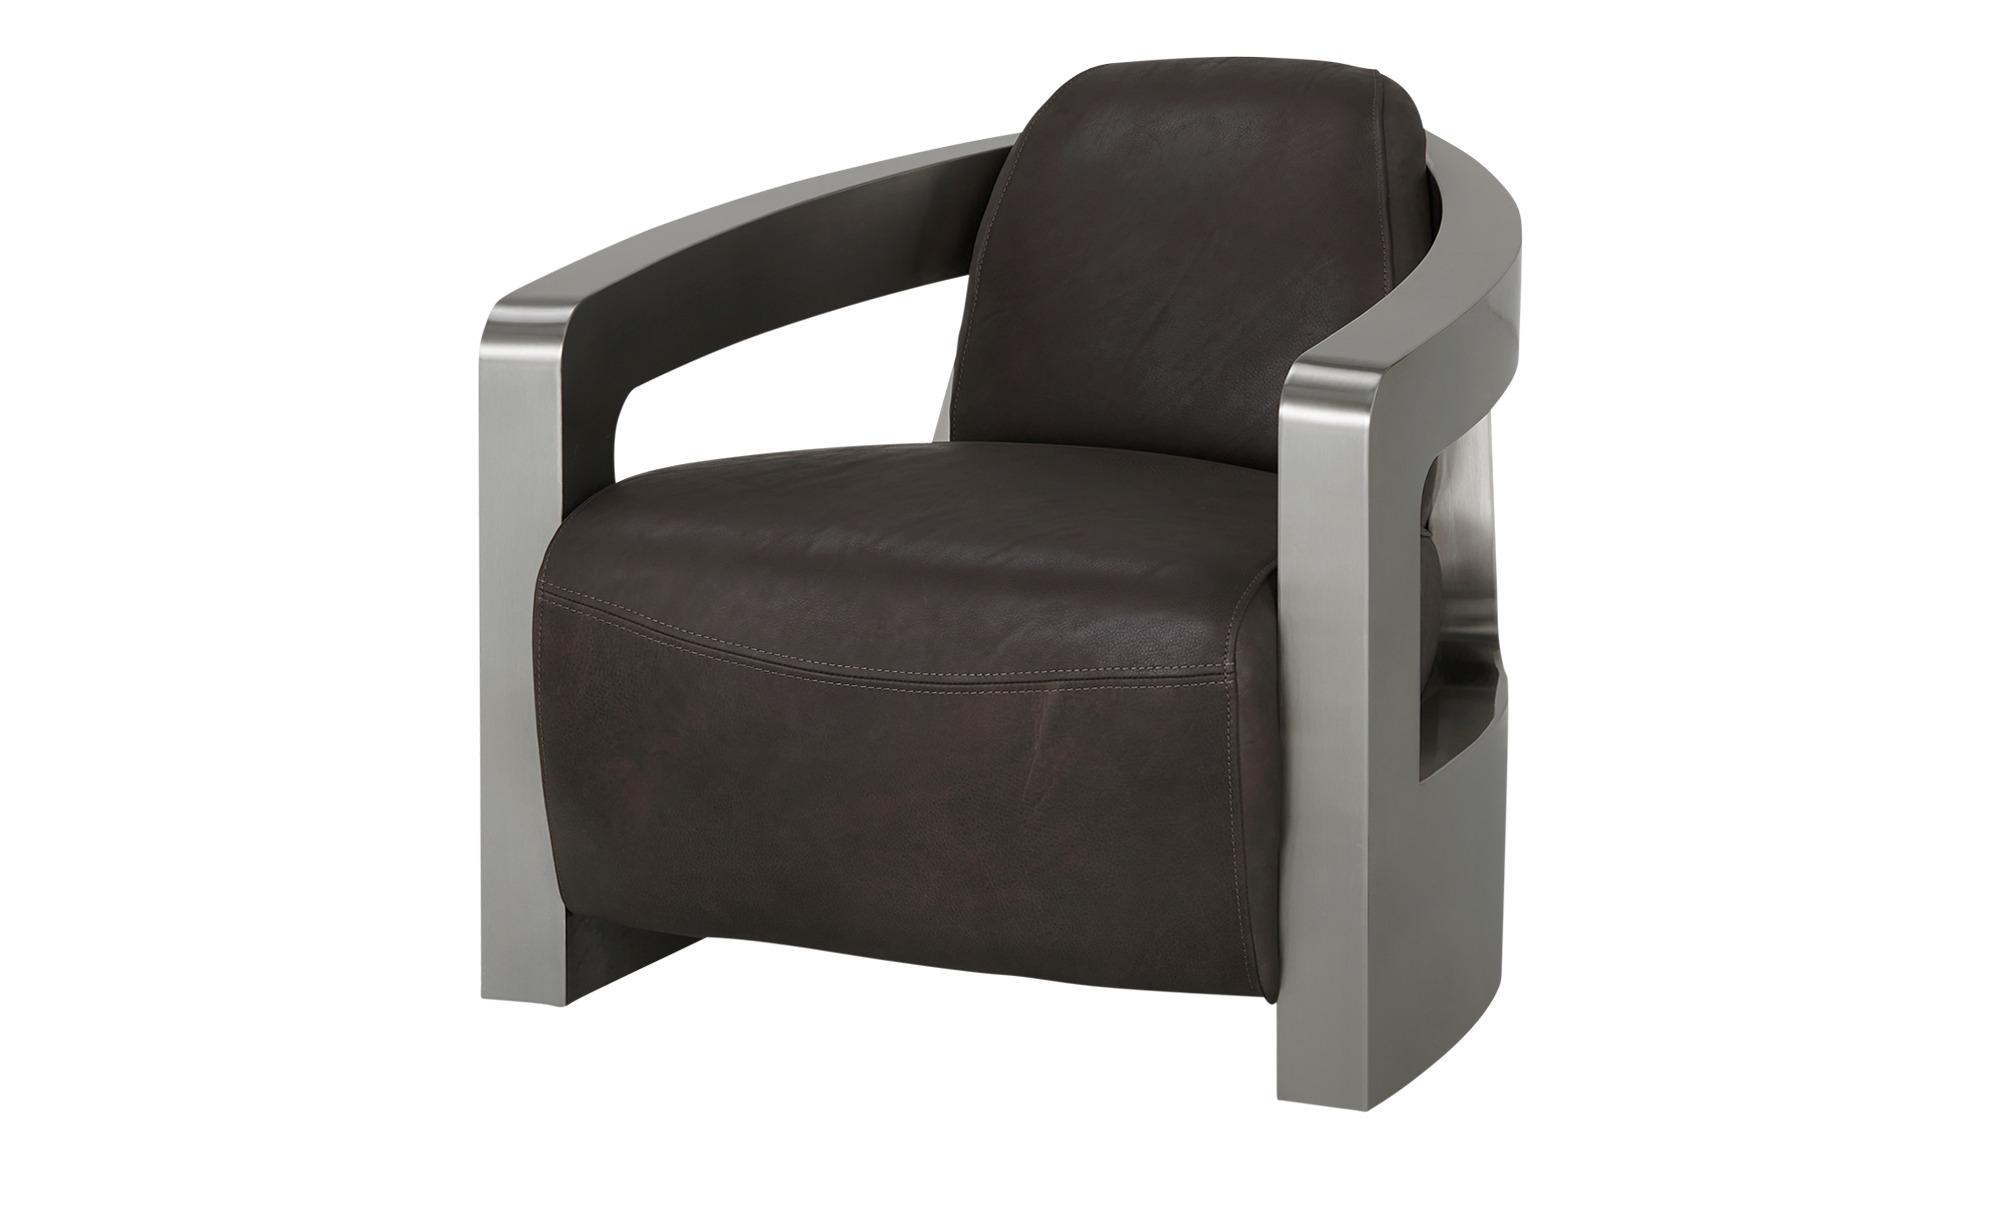 Sessel im Industriallook  Tyson ¦ braun ¦ Maße (cm): B: 76 H: 70 T: 85 Polstermöbel > Sessel > Ledersessel - Höffner